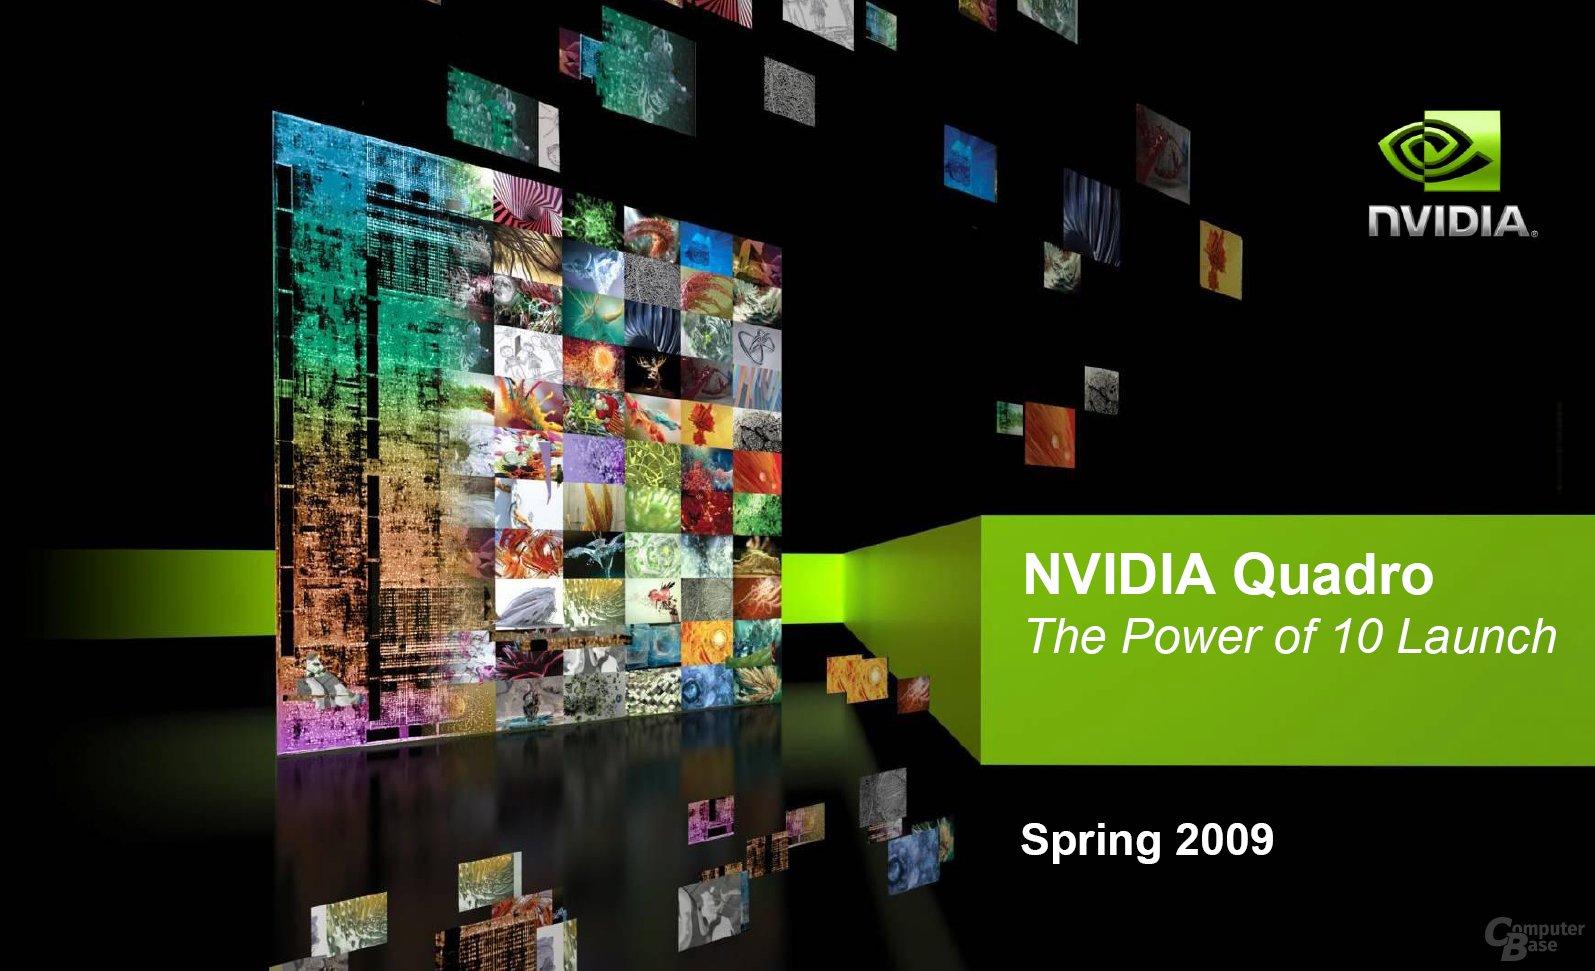 Nvidia Quadro im Frühjahr 2009